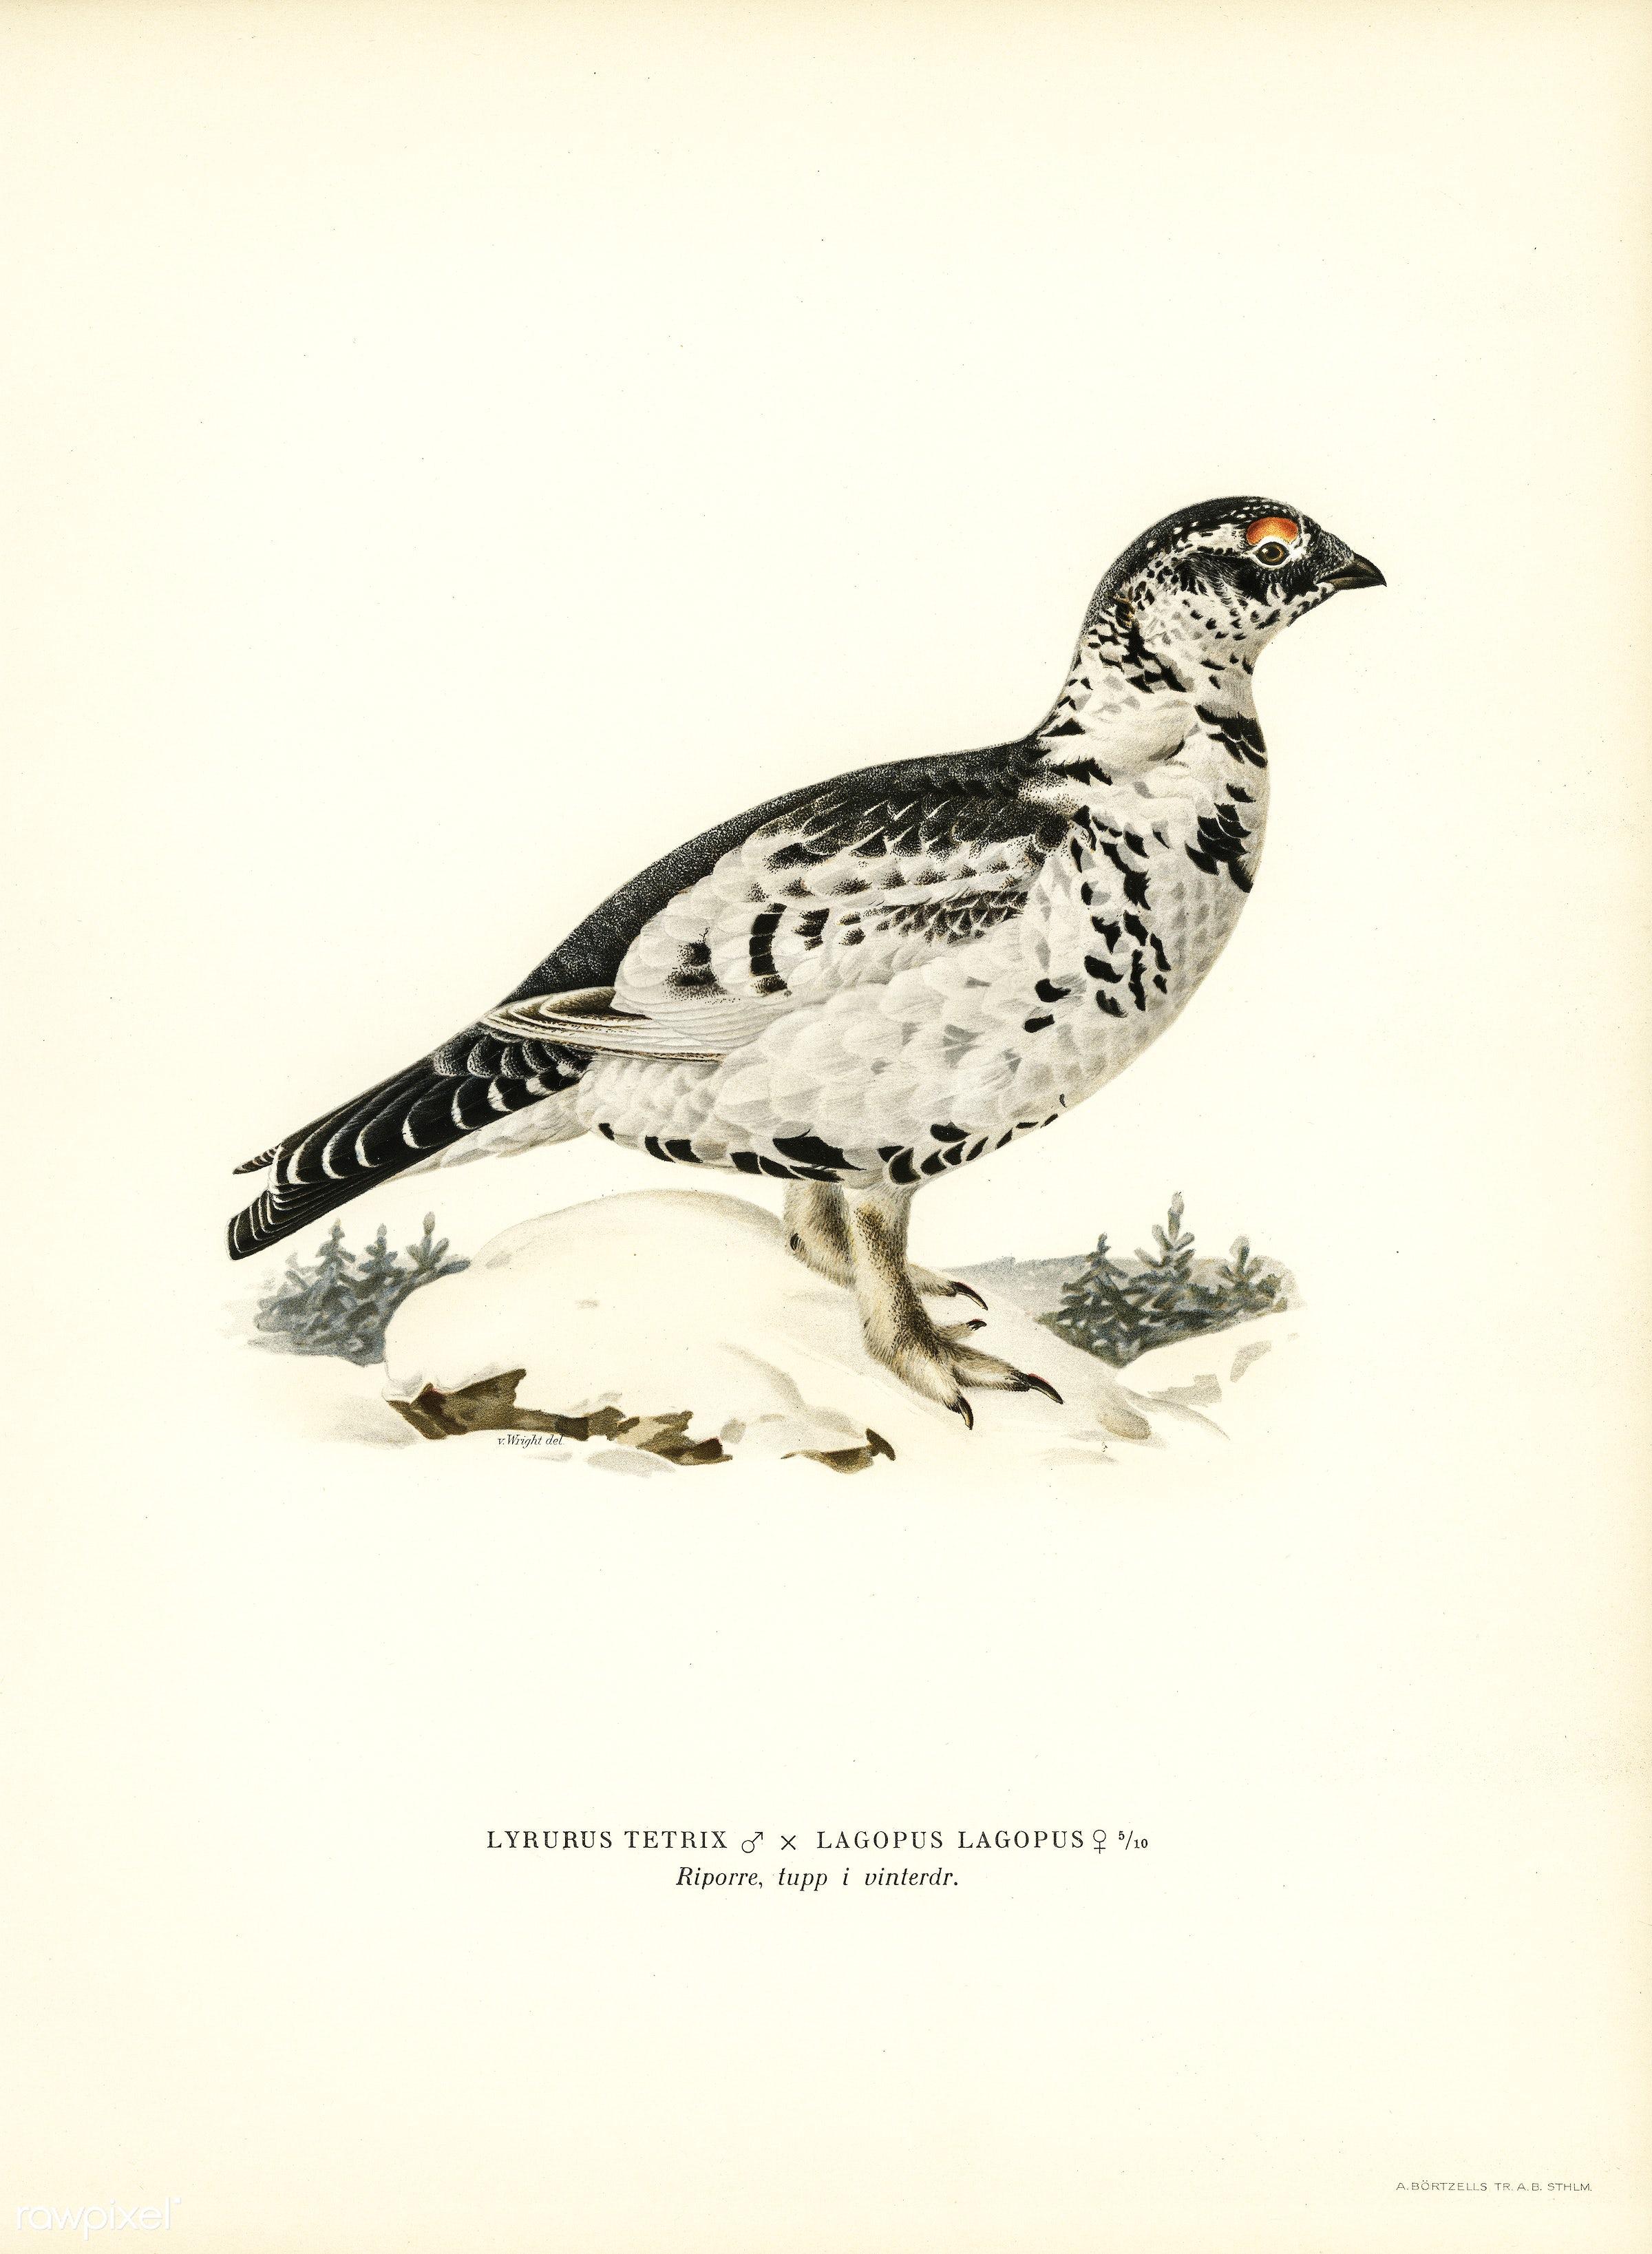 Hybrid between Black grouse and Willow ptarmigan (Lyrurus tetrix ♂ x lagopus lagopus ♀) illustrated by the von Wright...